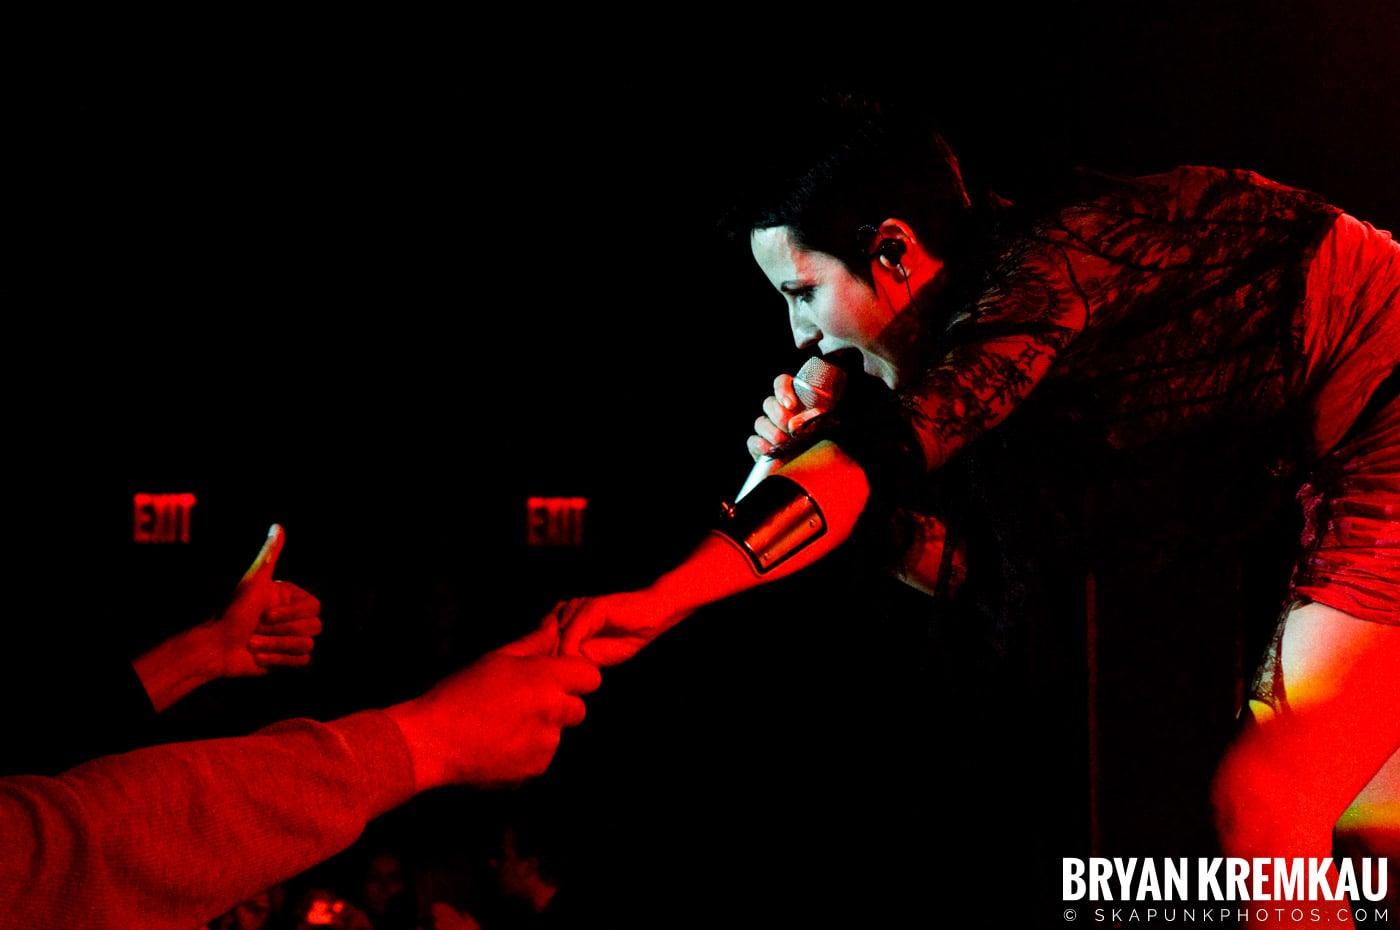 The Cranberries @ Nokia Theatre, NYC - 11.18.09 (16)